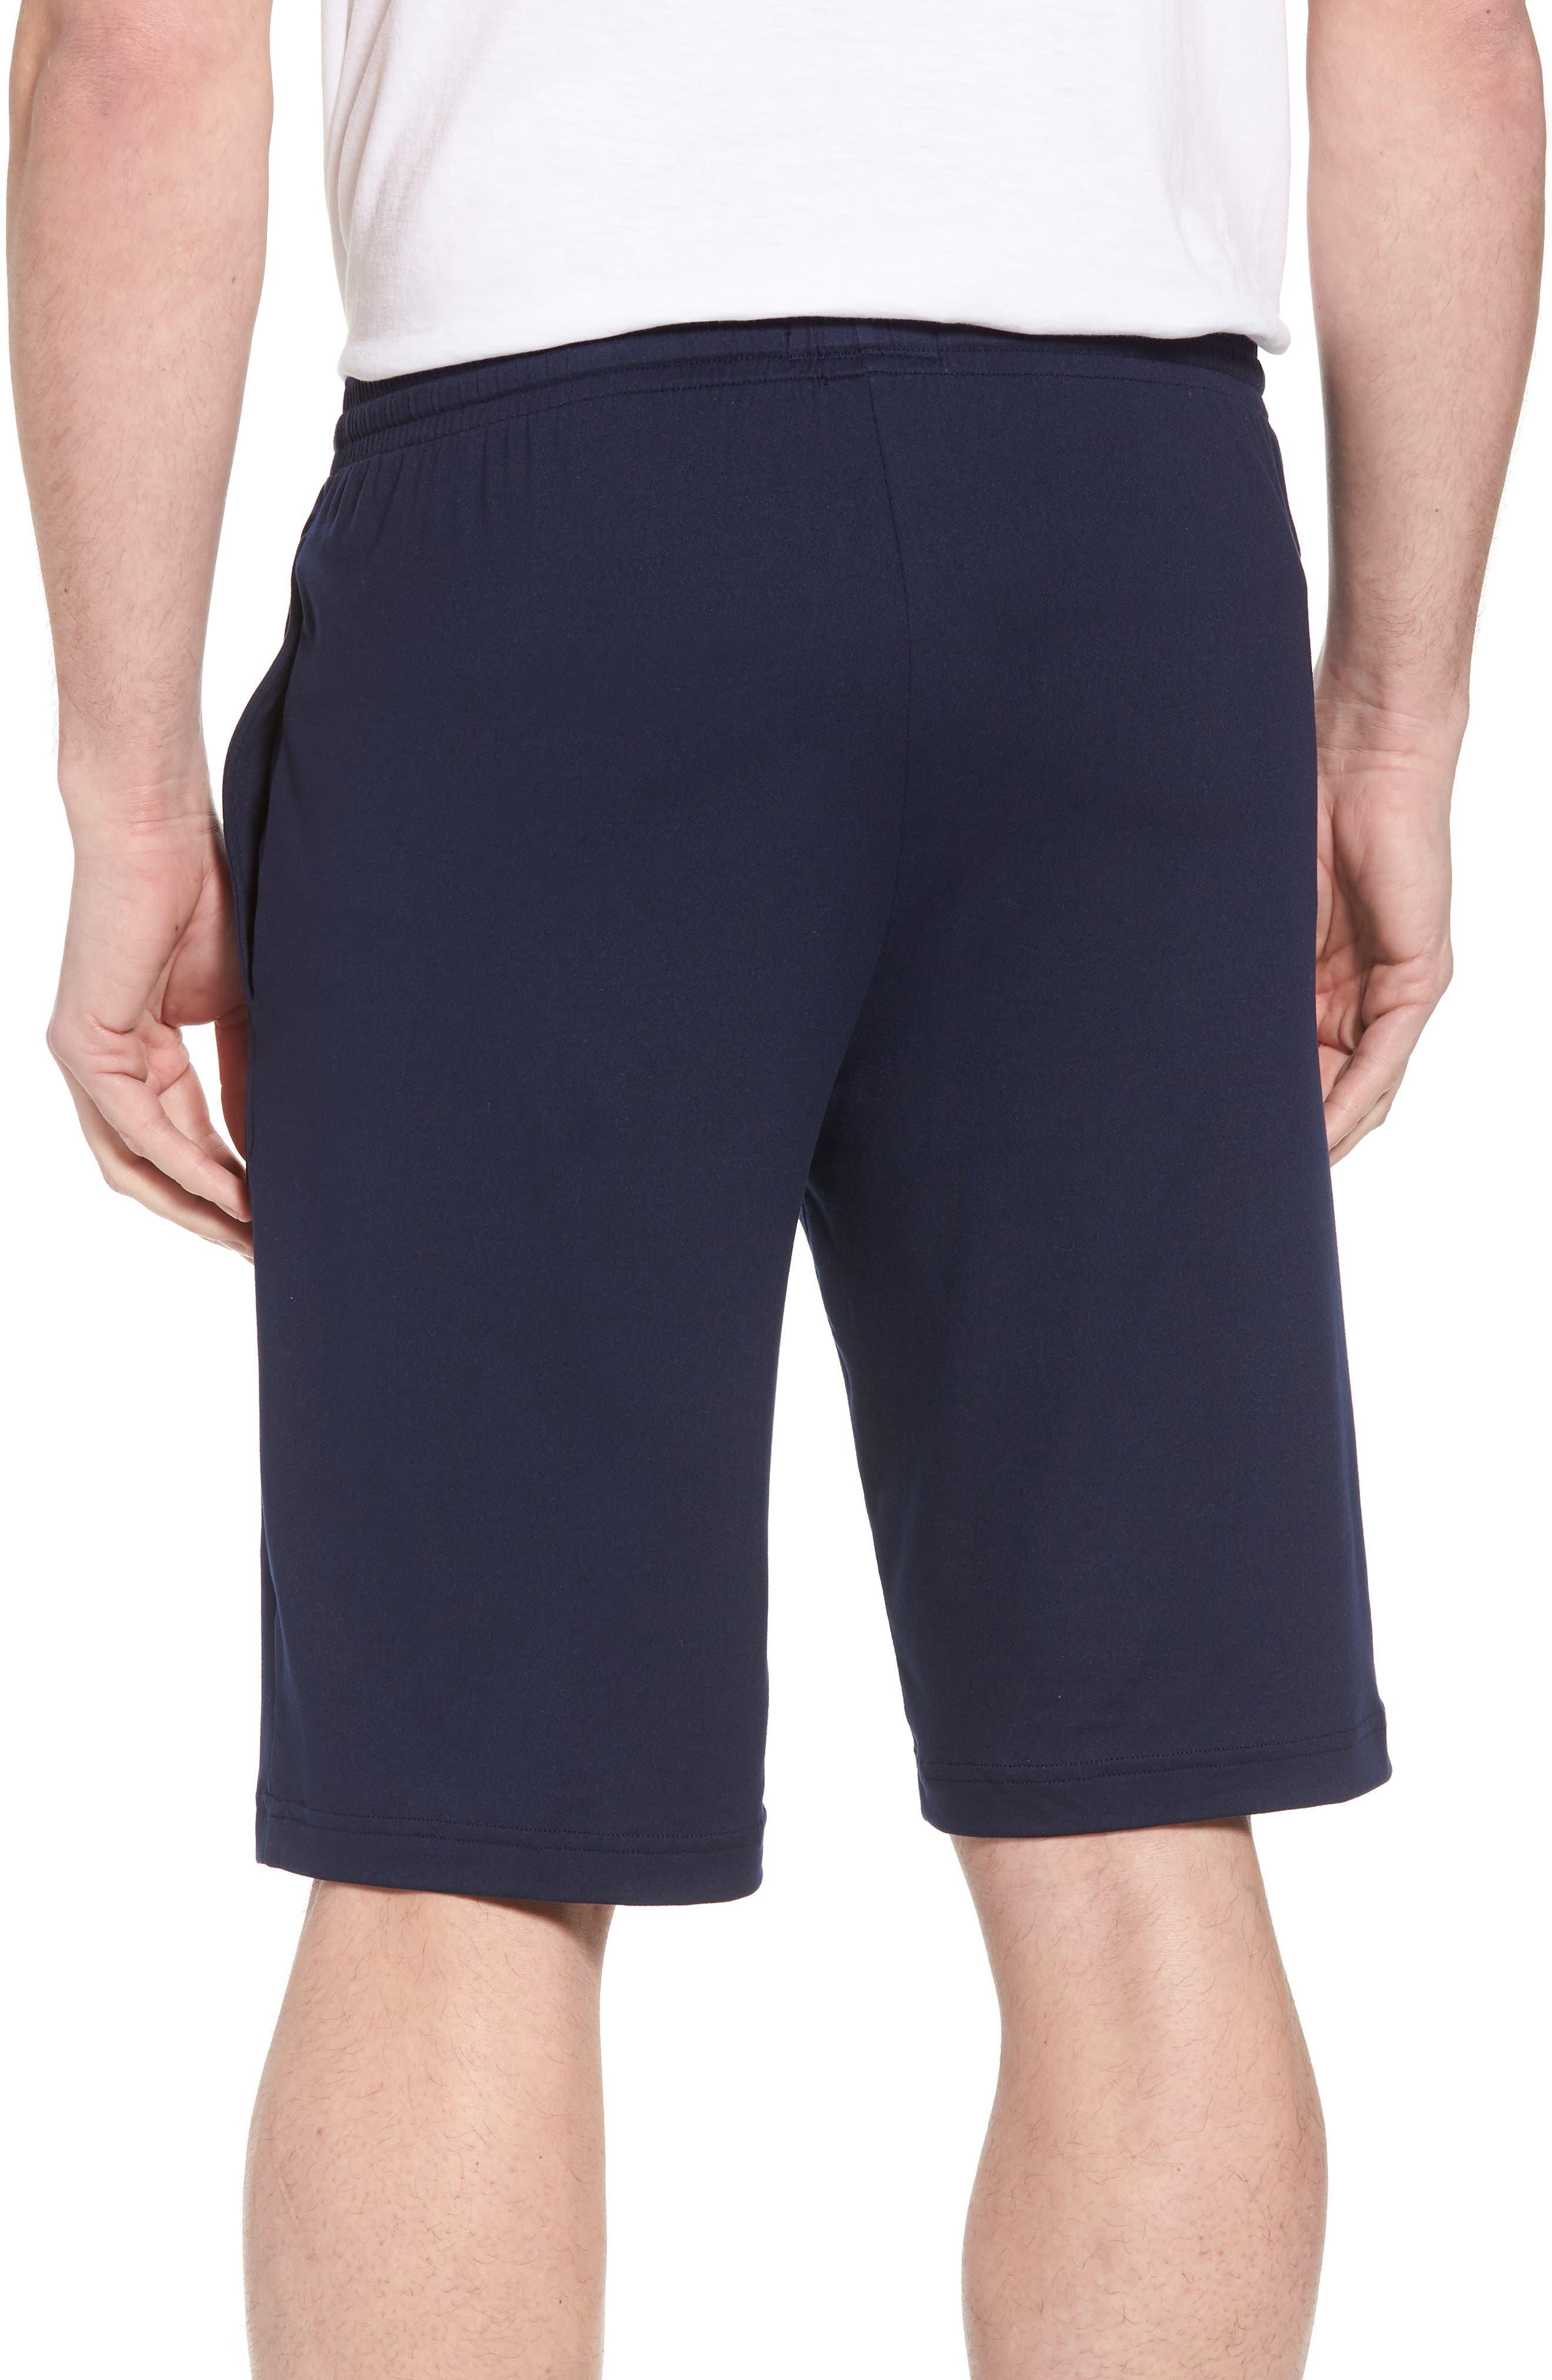 Alternate Image 2  - Polo Ralph Lauren Therma Lounge Shorts